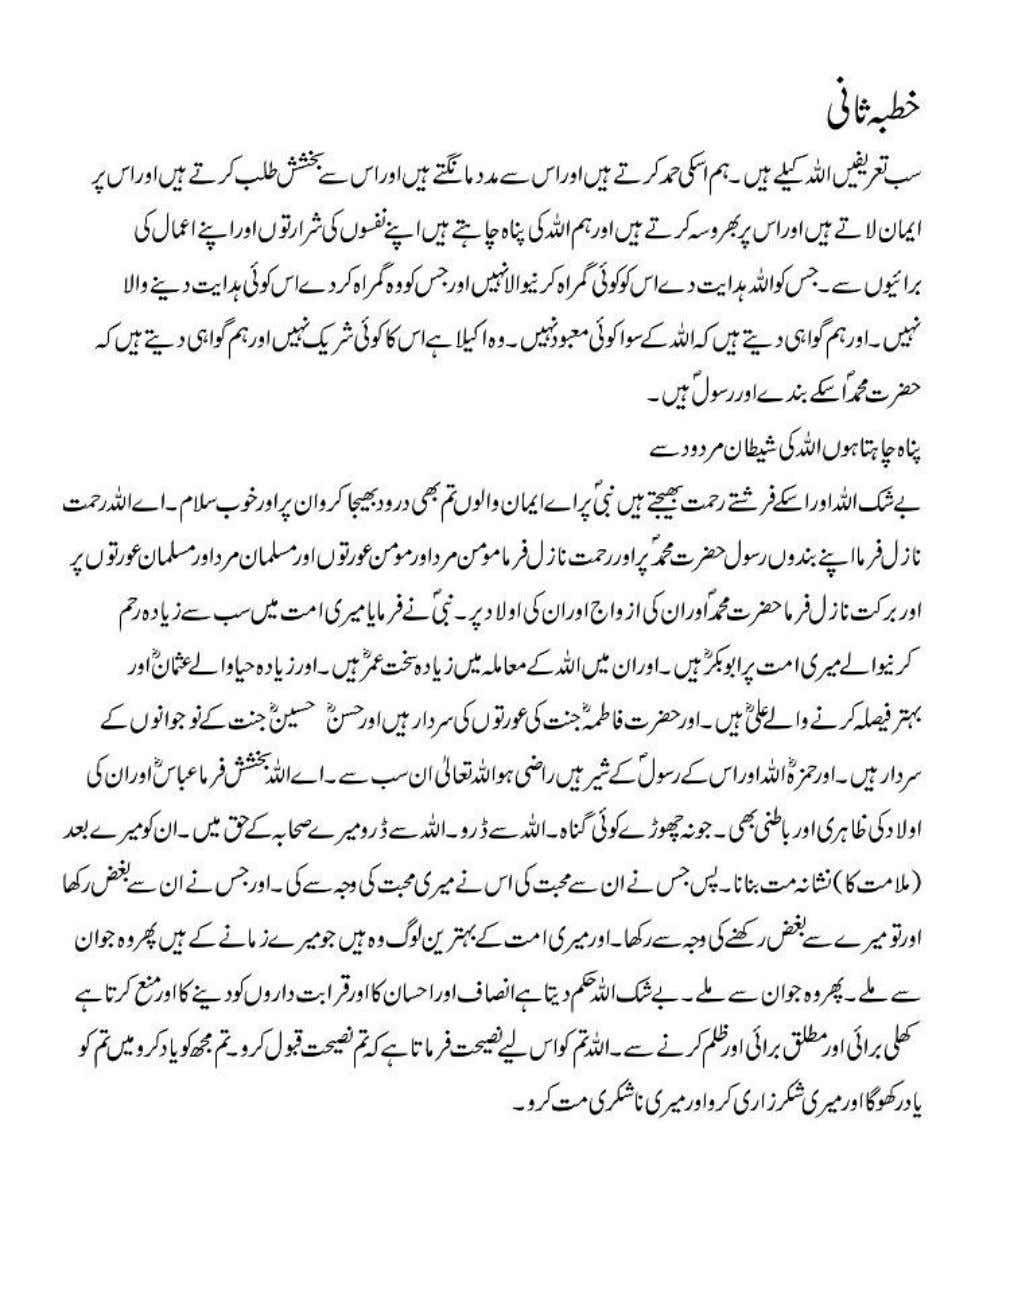 Khutba E Jumah With Urdu Translation Awal Aur Sani In 2020 Pdf Books Download Free Pdf Books Urdu